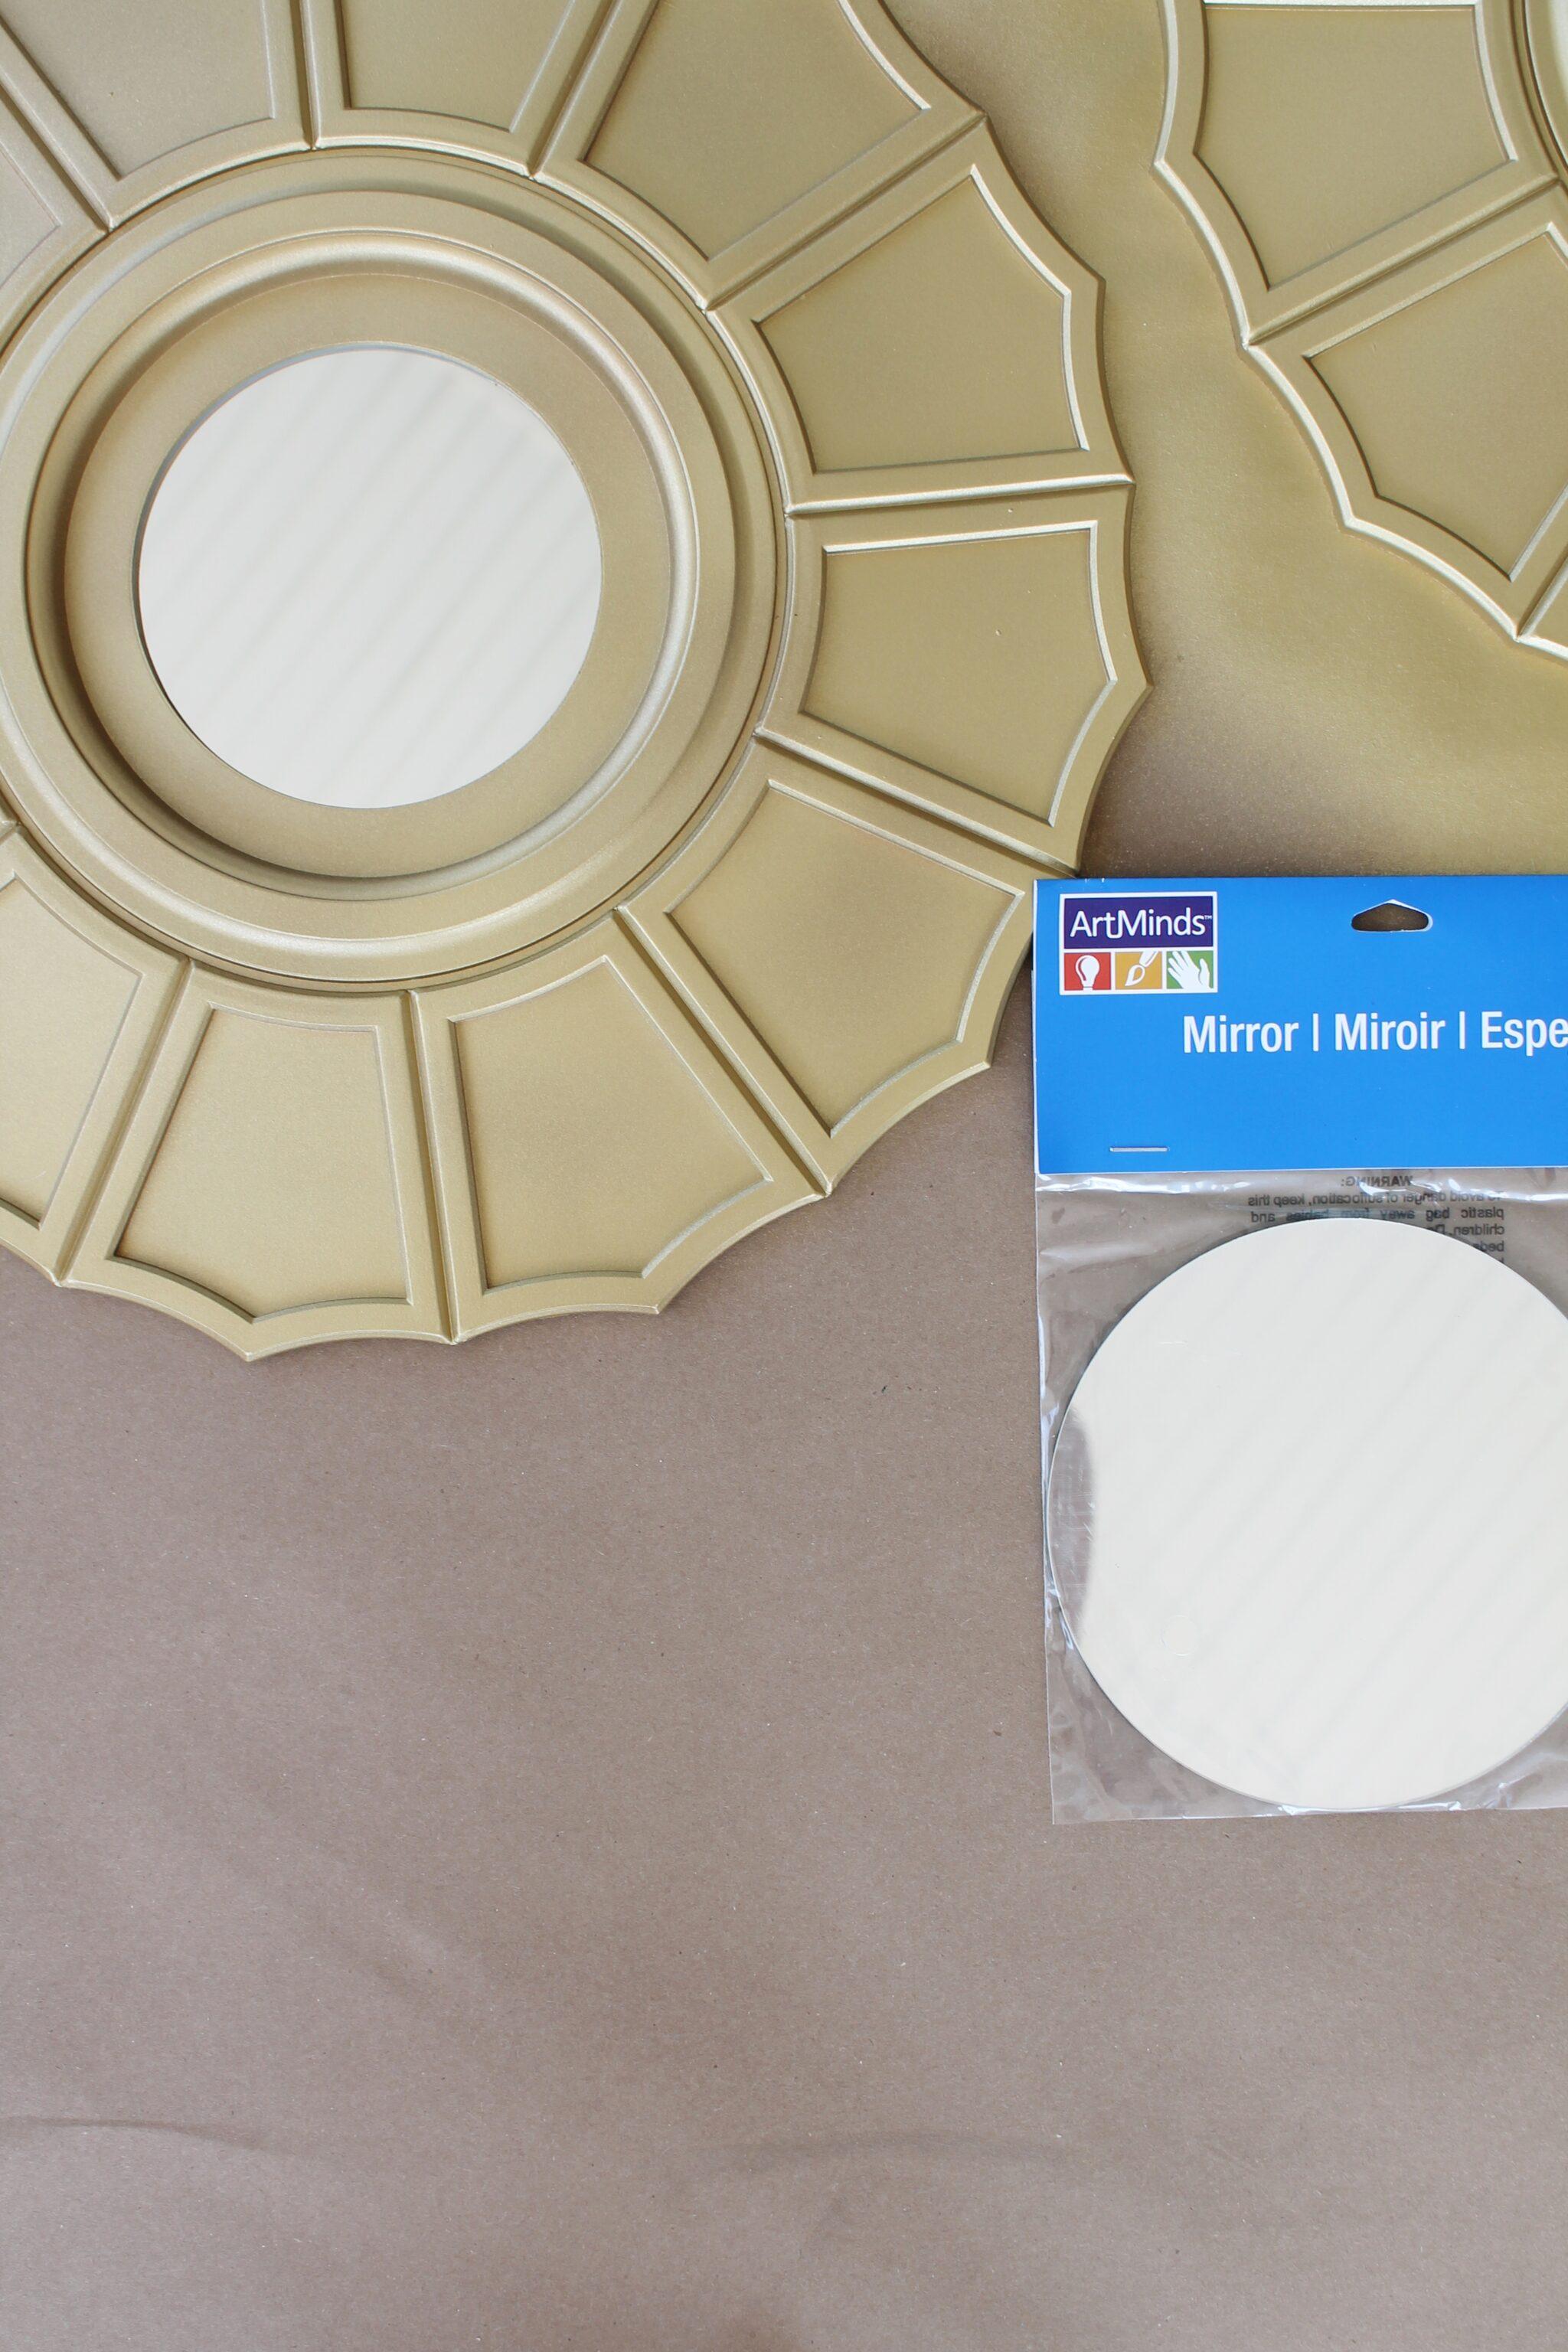 Hooks Adhesive Heavy Mirrors